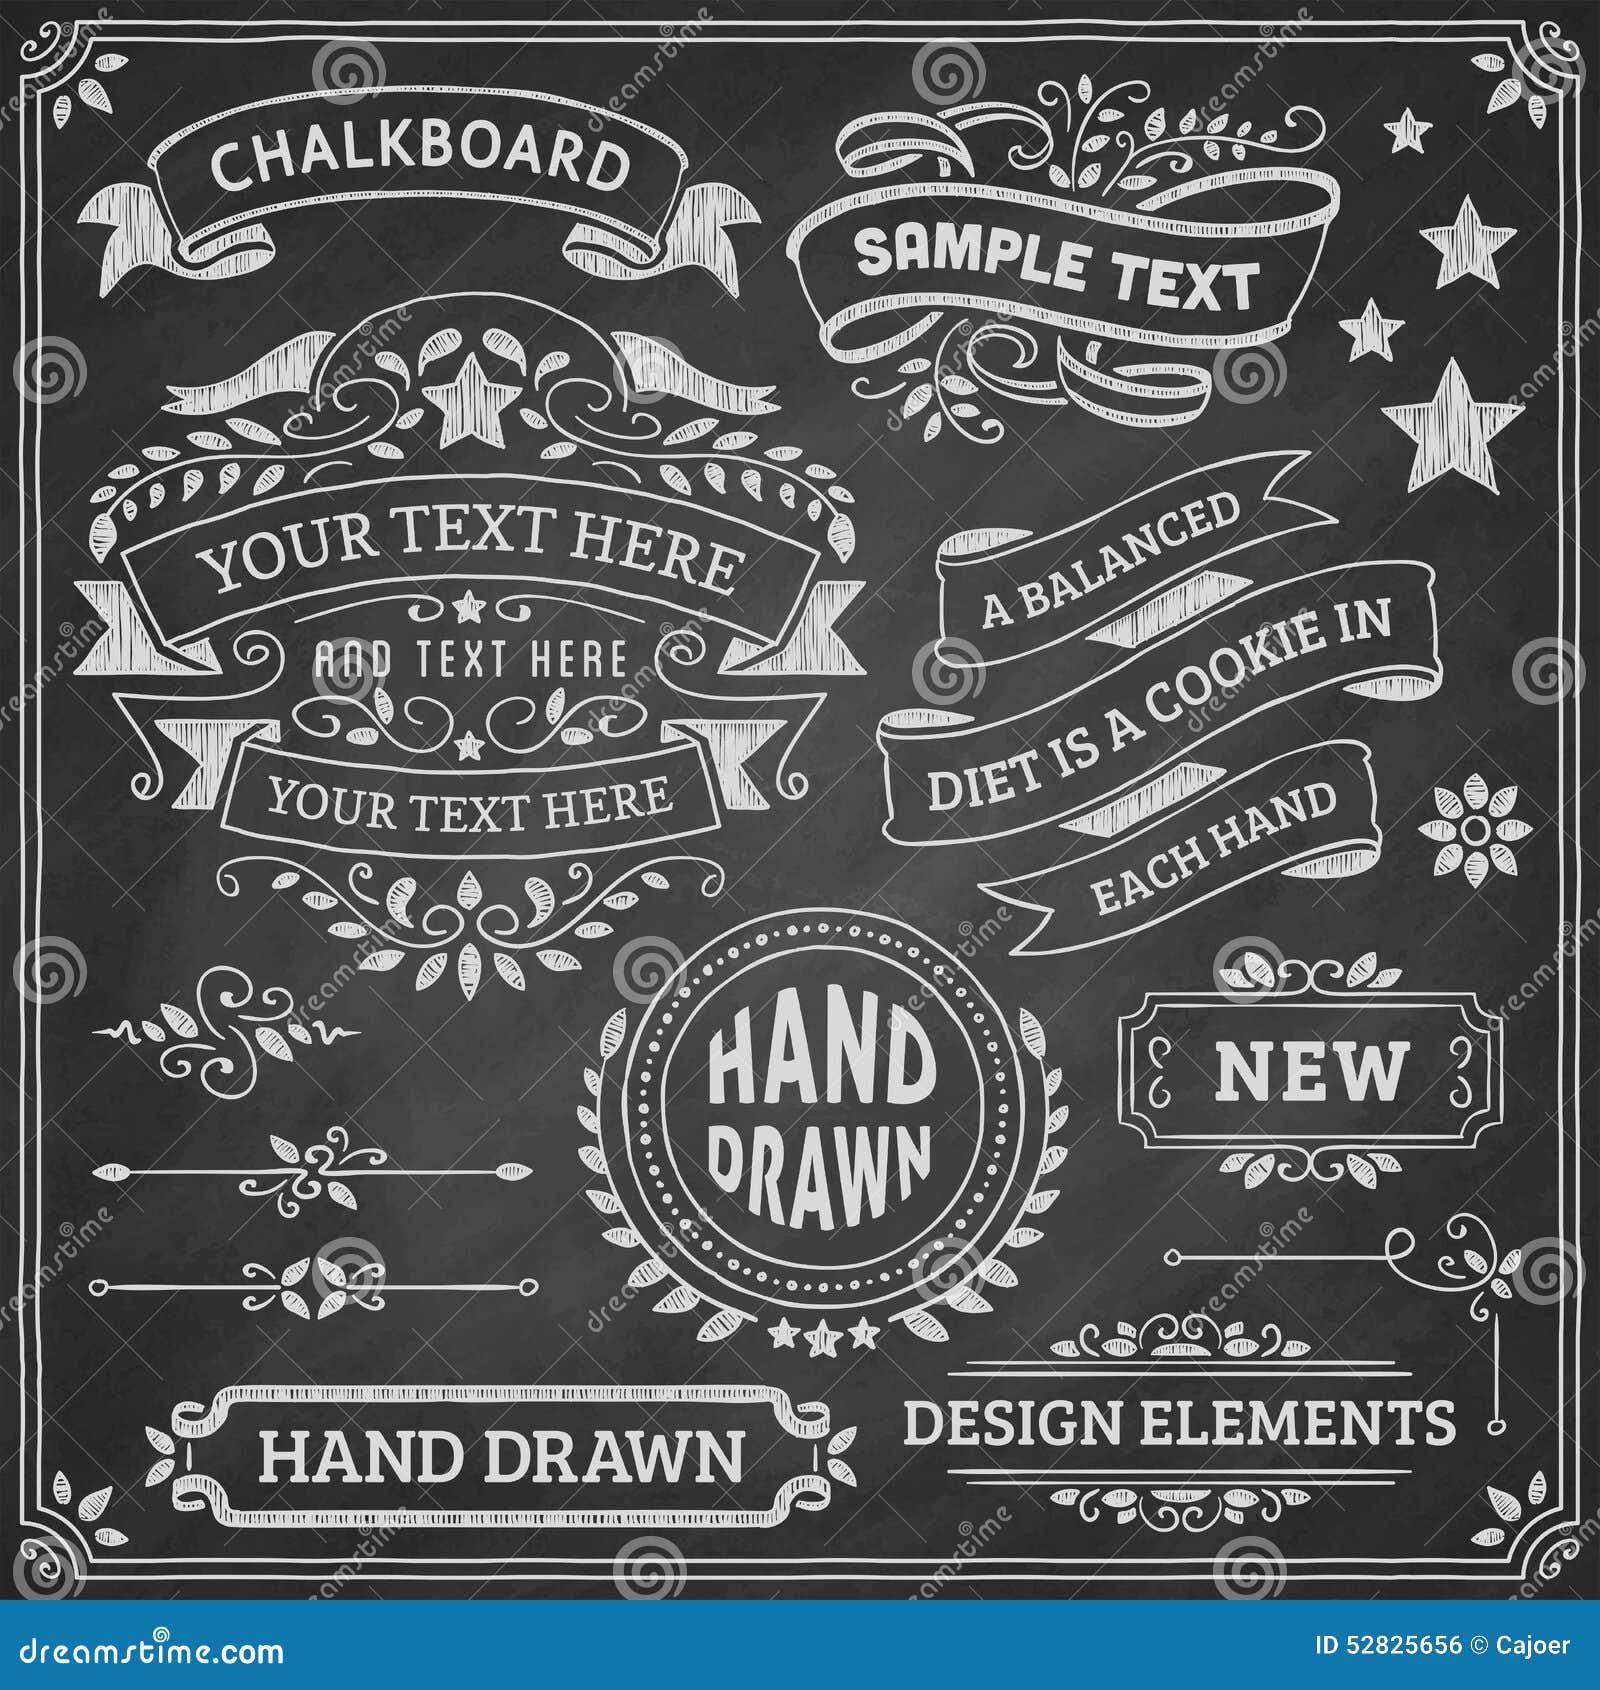 chalkboard design elements stock vector illustration of